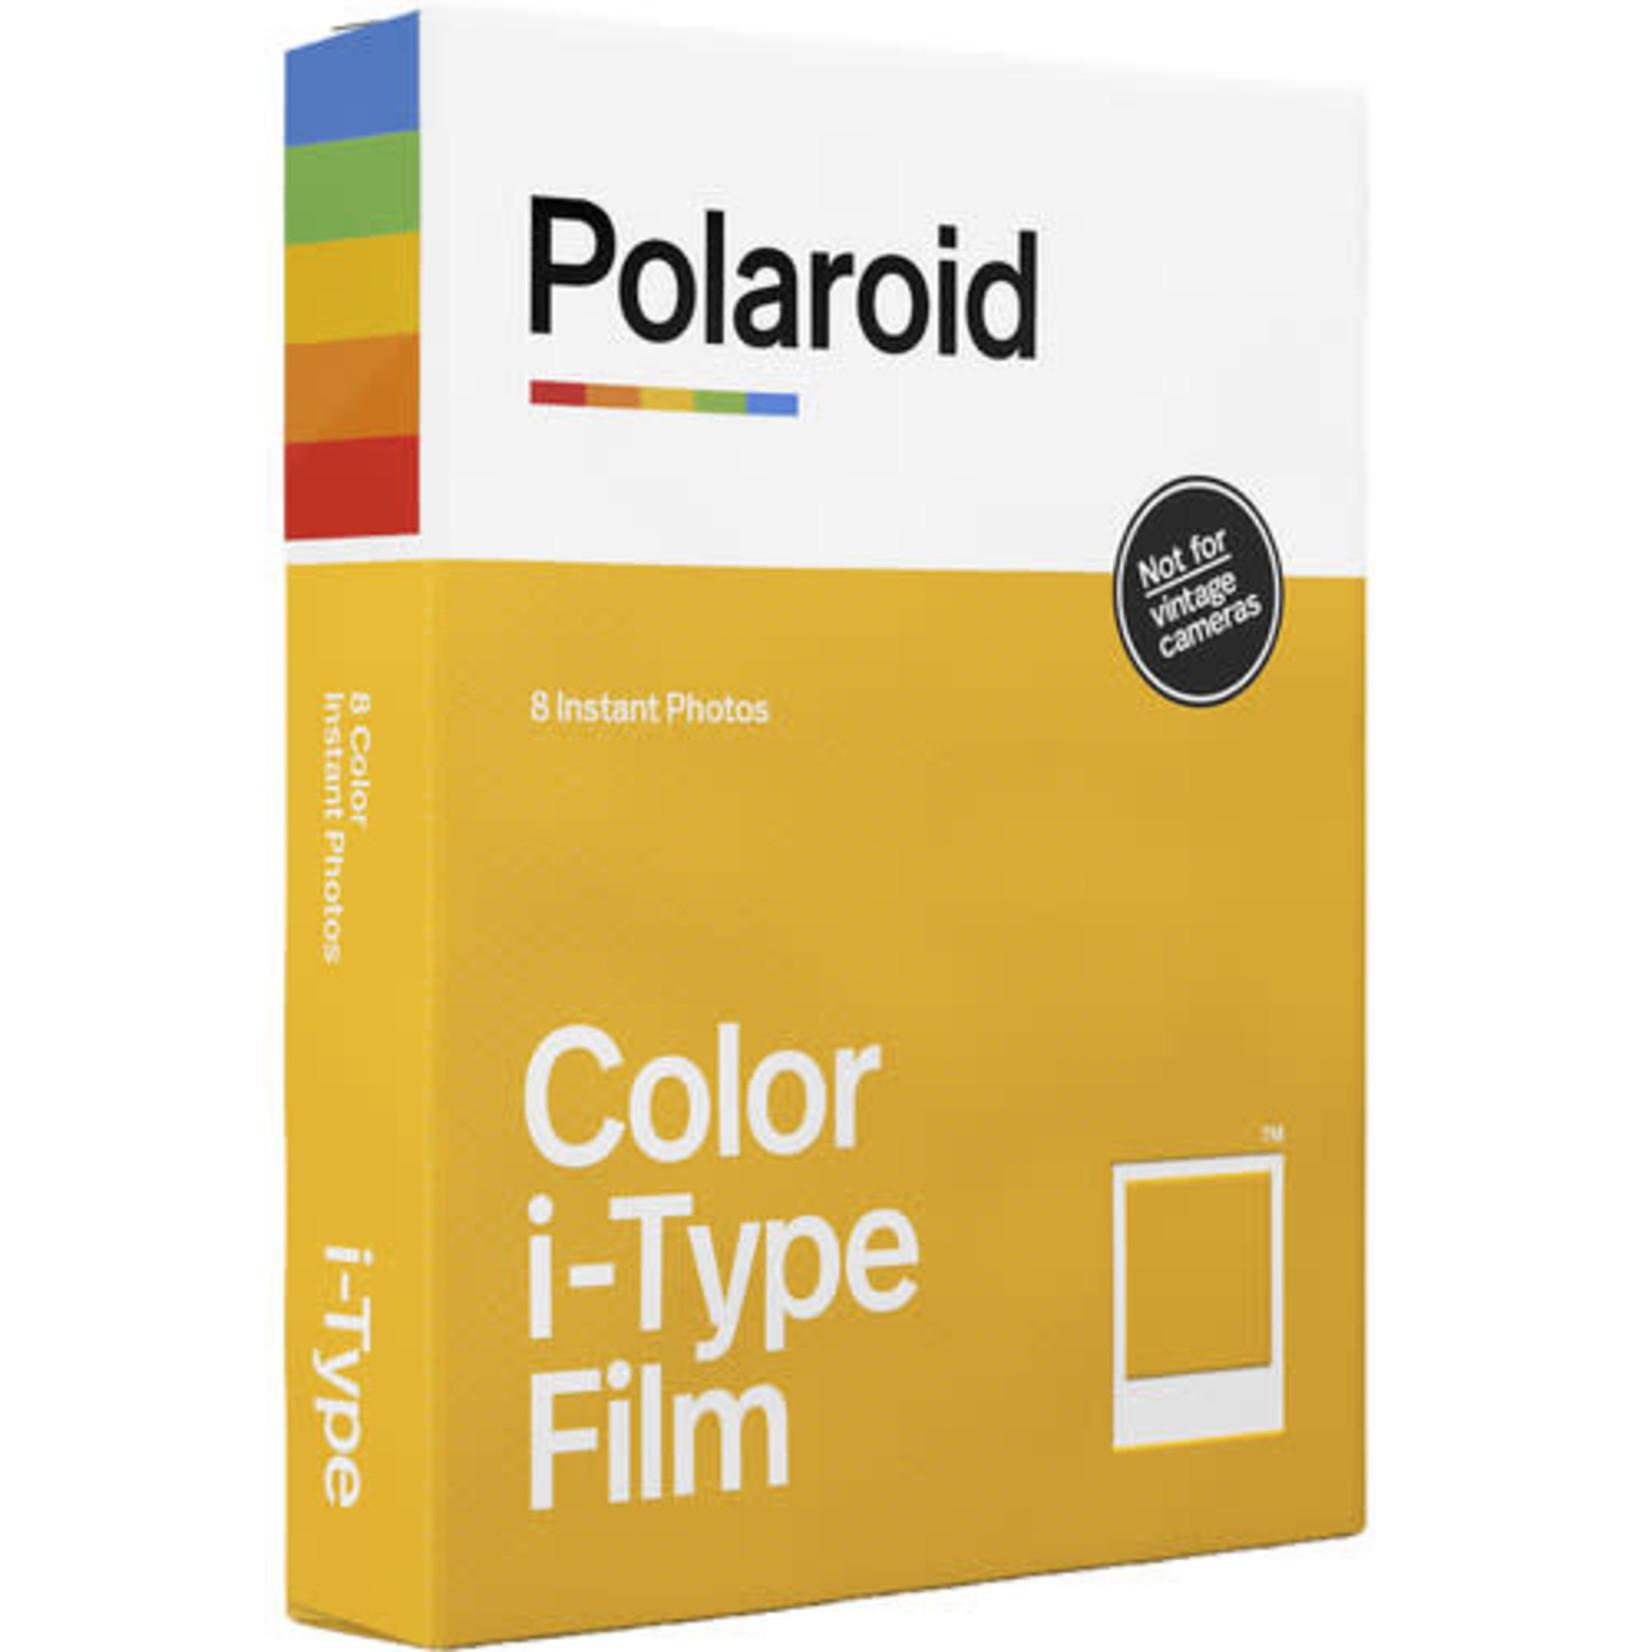 Polaroid Polaroid Color i-Type Instant Film (8 Exposures)